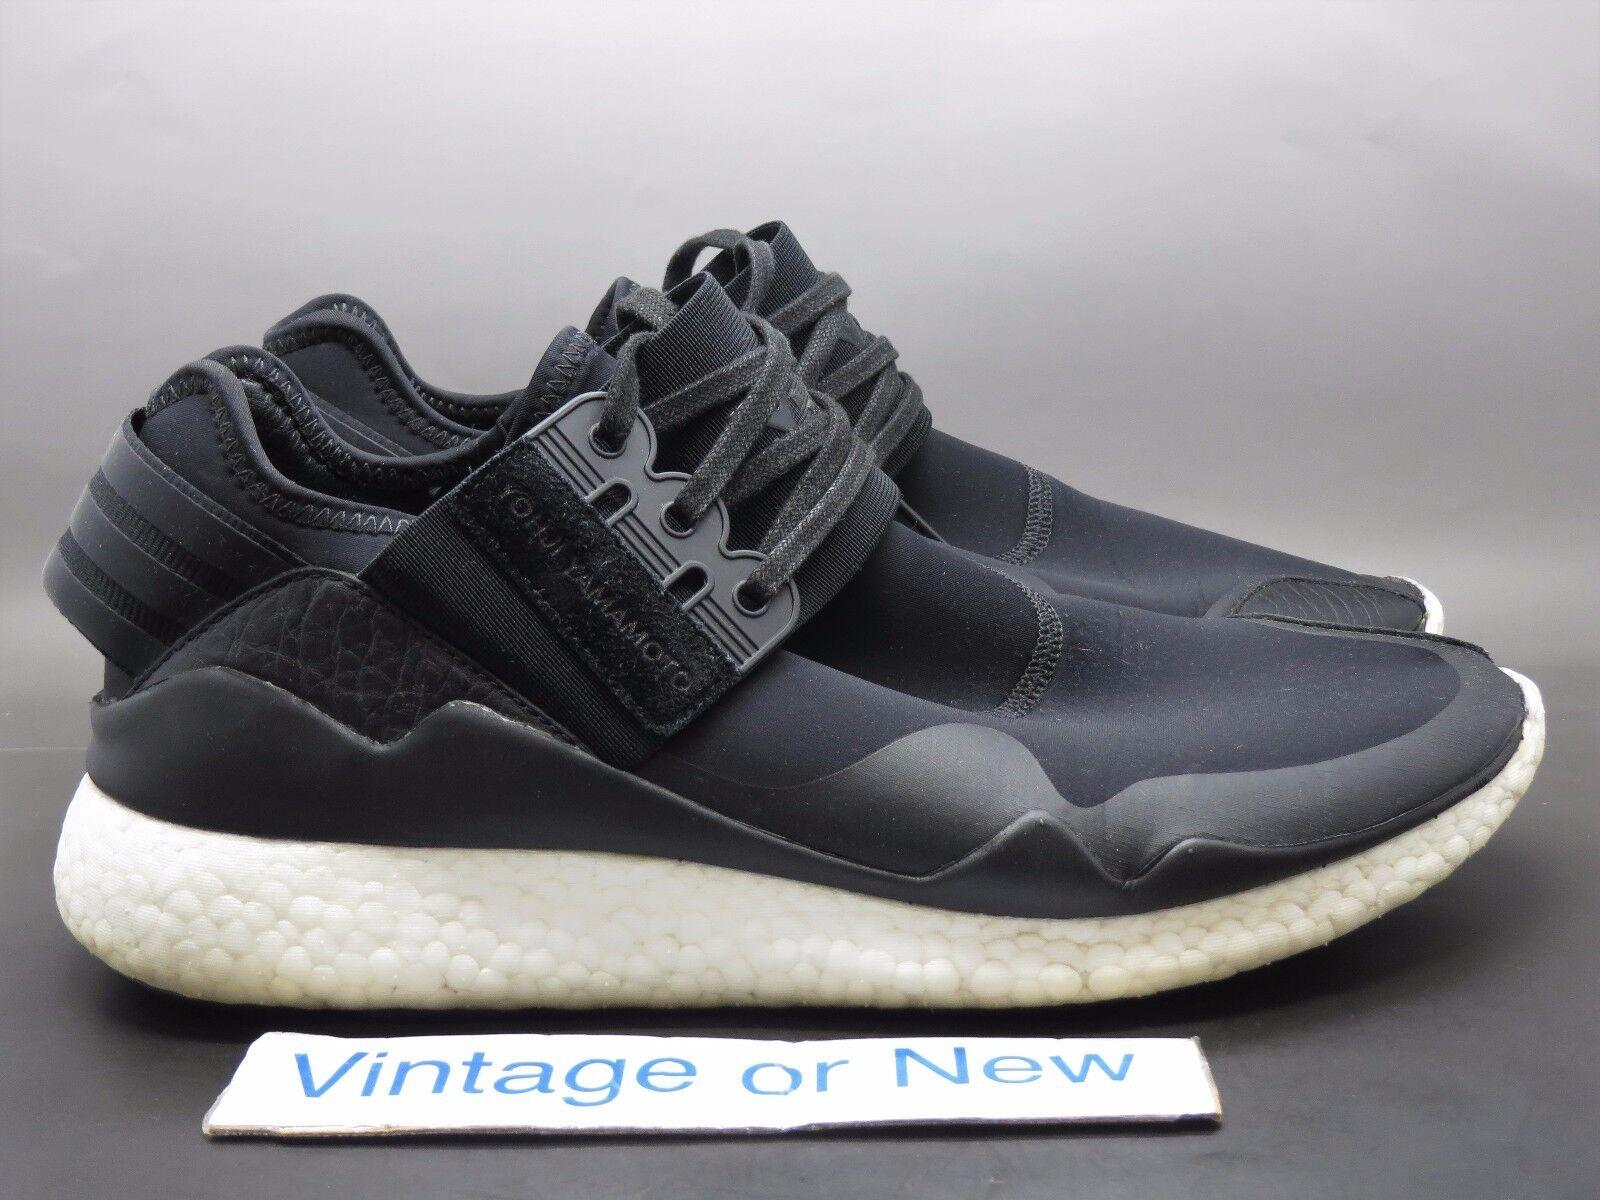 Men's Adidas Y-3 Retro Boost Yohji Yamamoto Black Running Shoes S83256 Price reduction